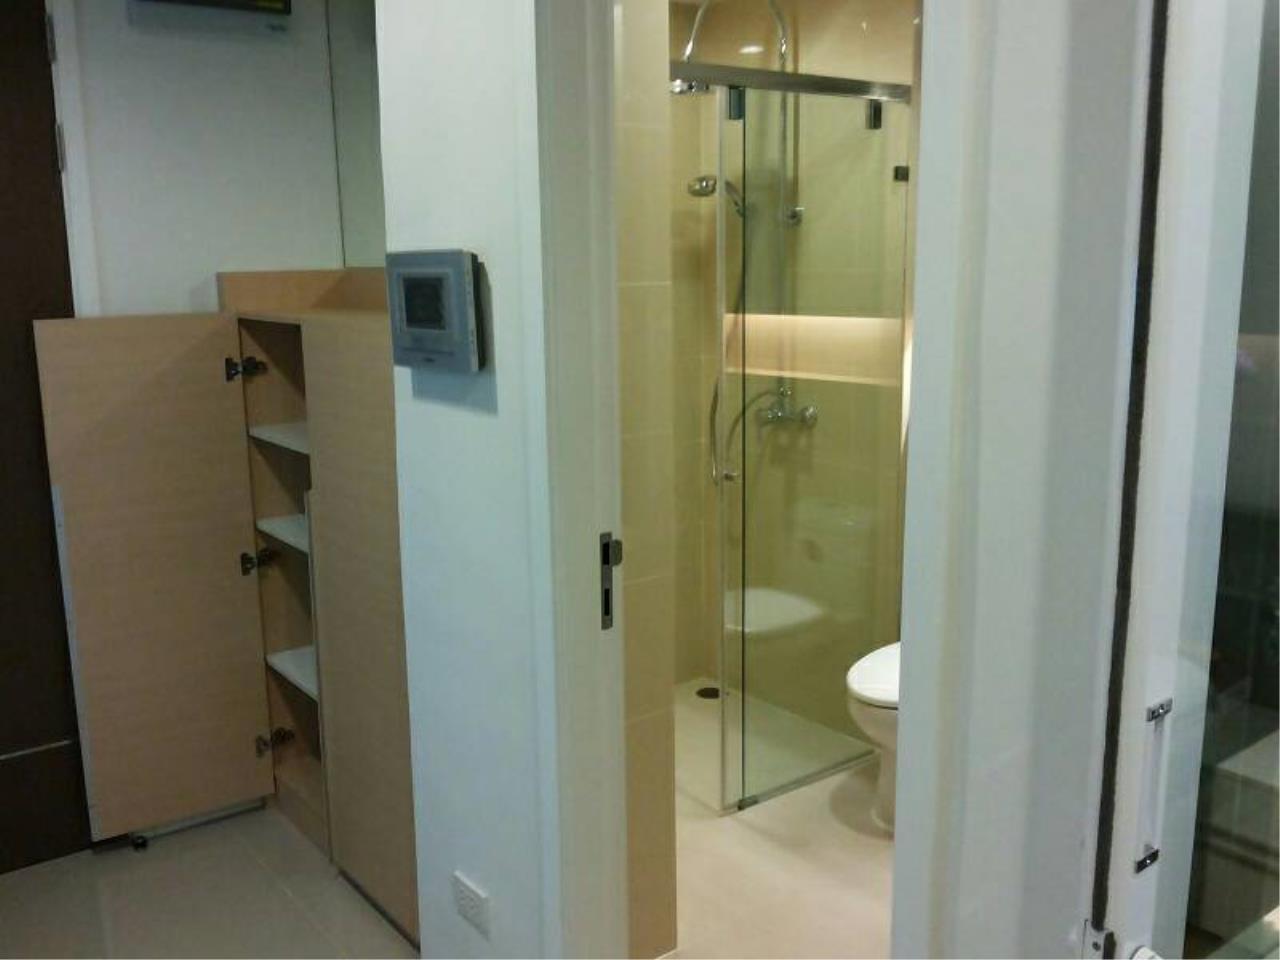 Quality Life Property Agency's FOR RENT! !! 15 SUKHUMVIT RESIDENCES / STUDIO 1 BETHROOM /  10 FLOOR 5